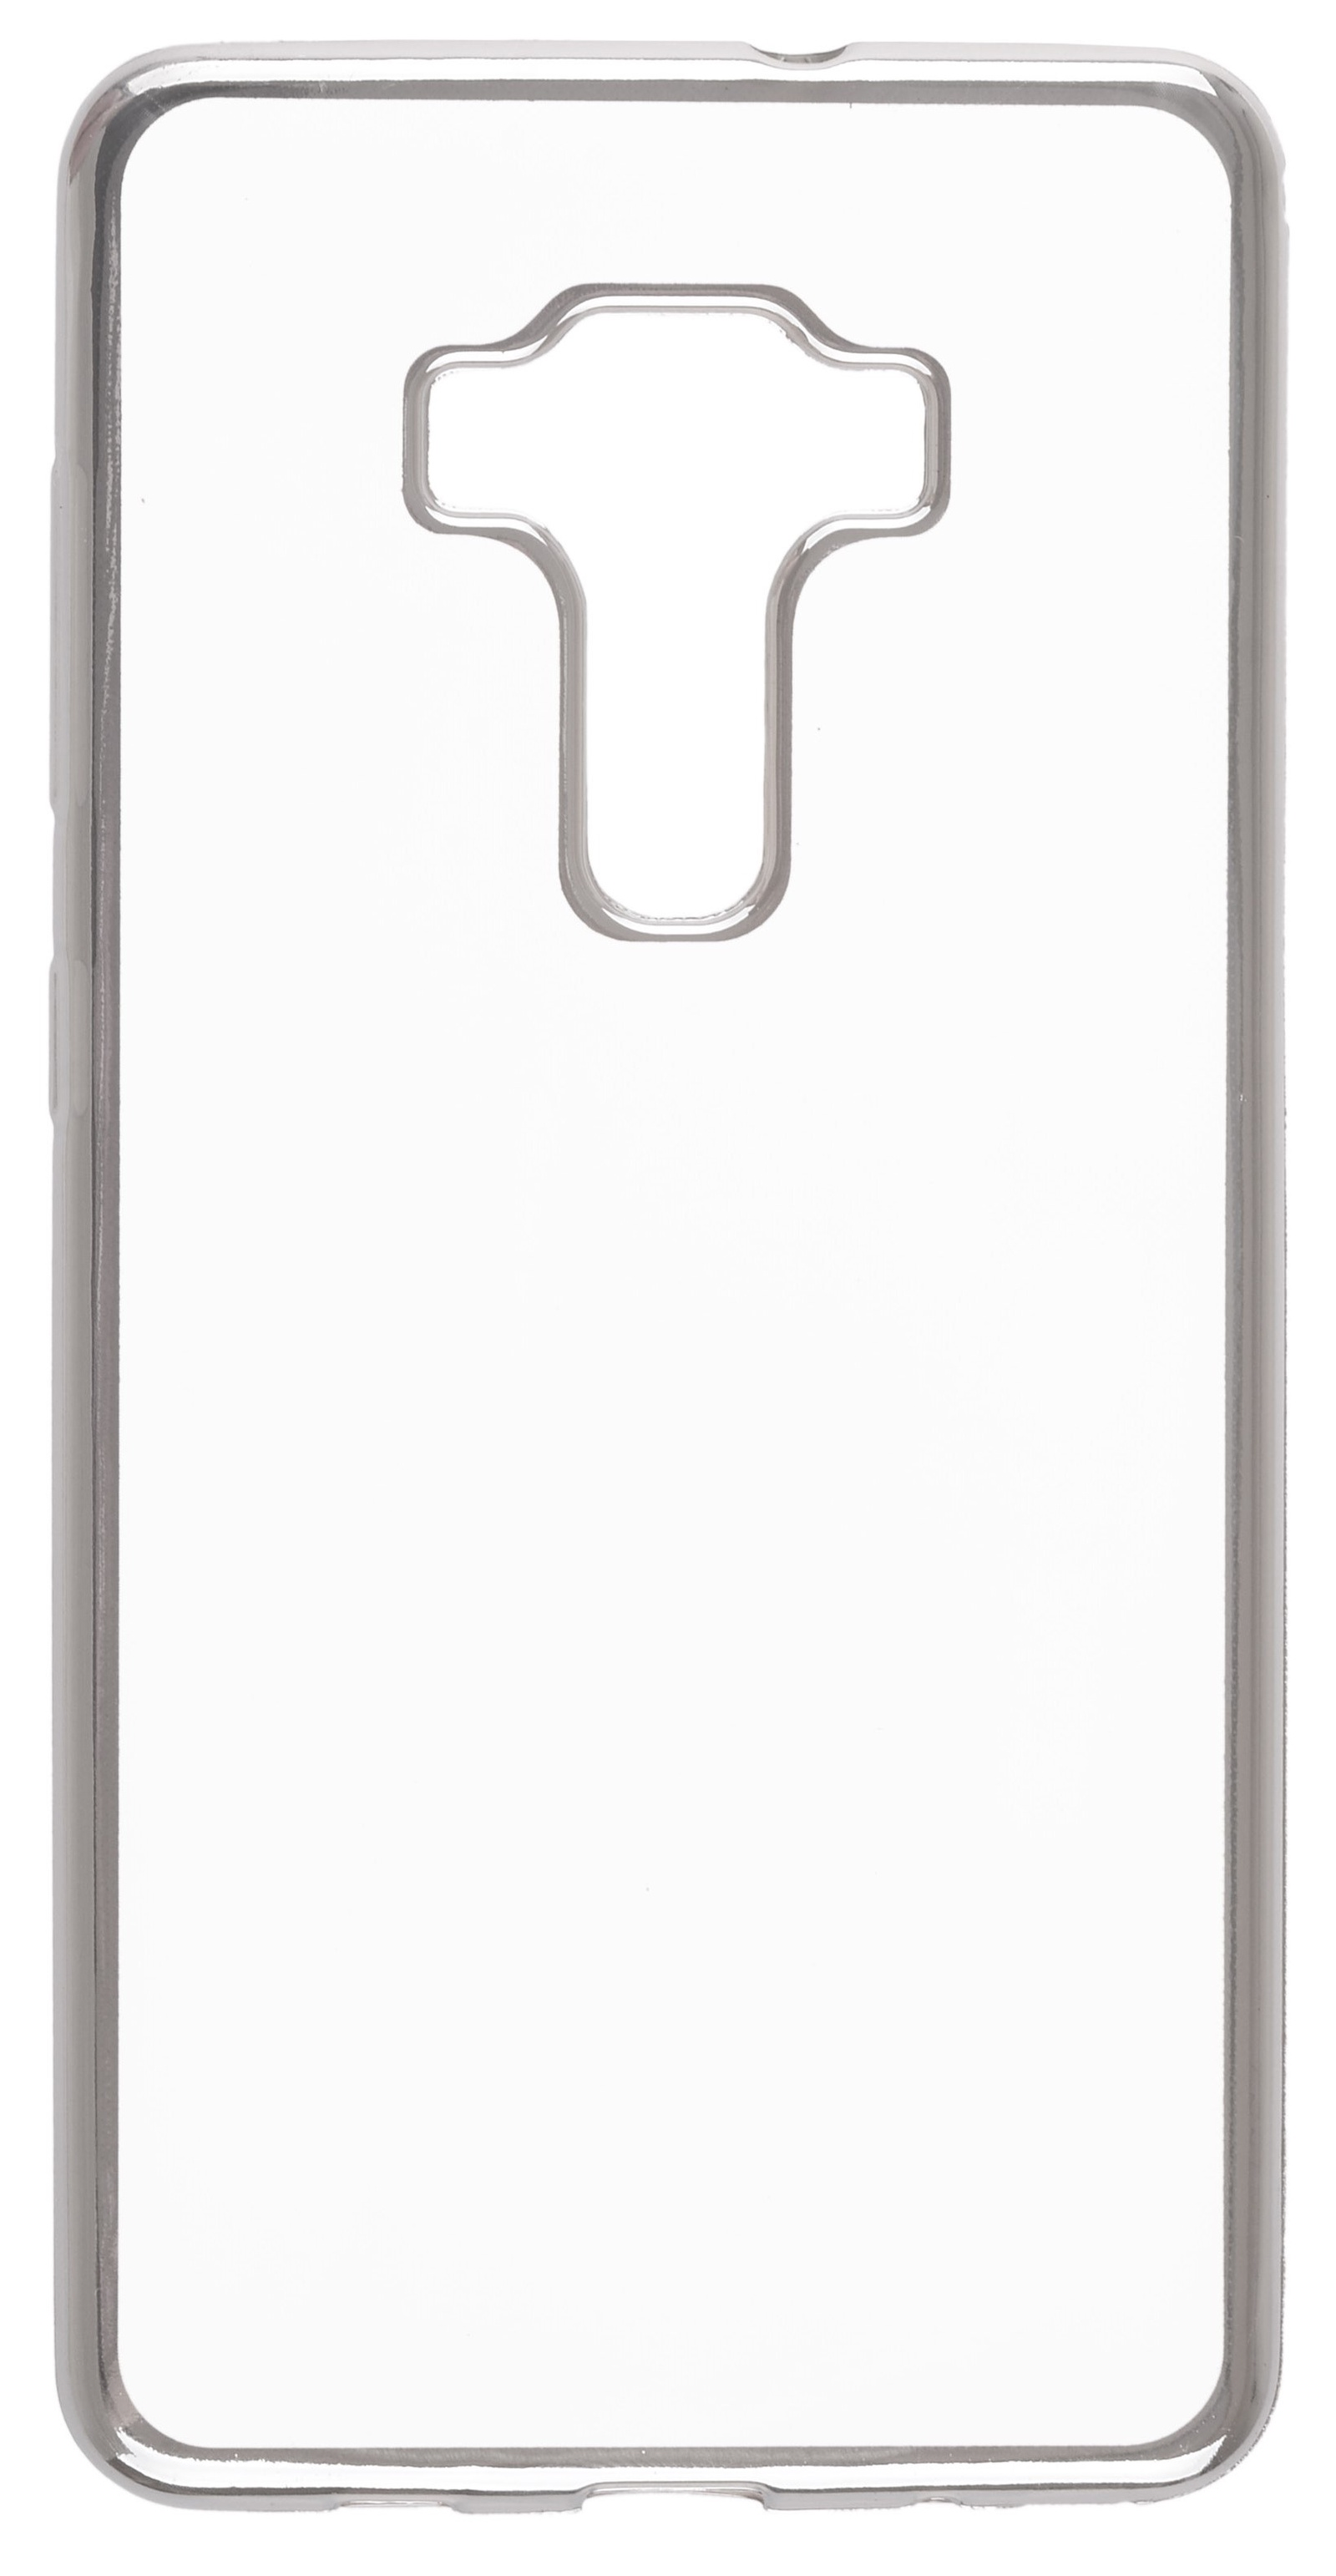 Чехол для сотового телефона skinBOX Silicone chrome border, 4630042528710, серебристый чехол для сотового телефона skinbox silicone chrome border 4630042528697 серебристый